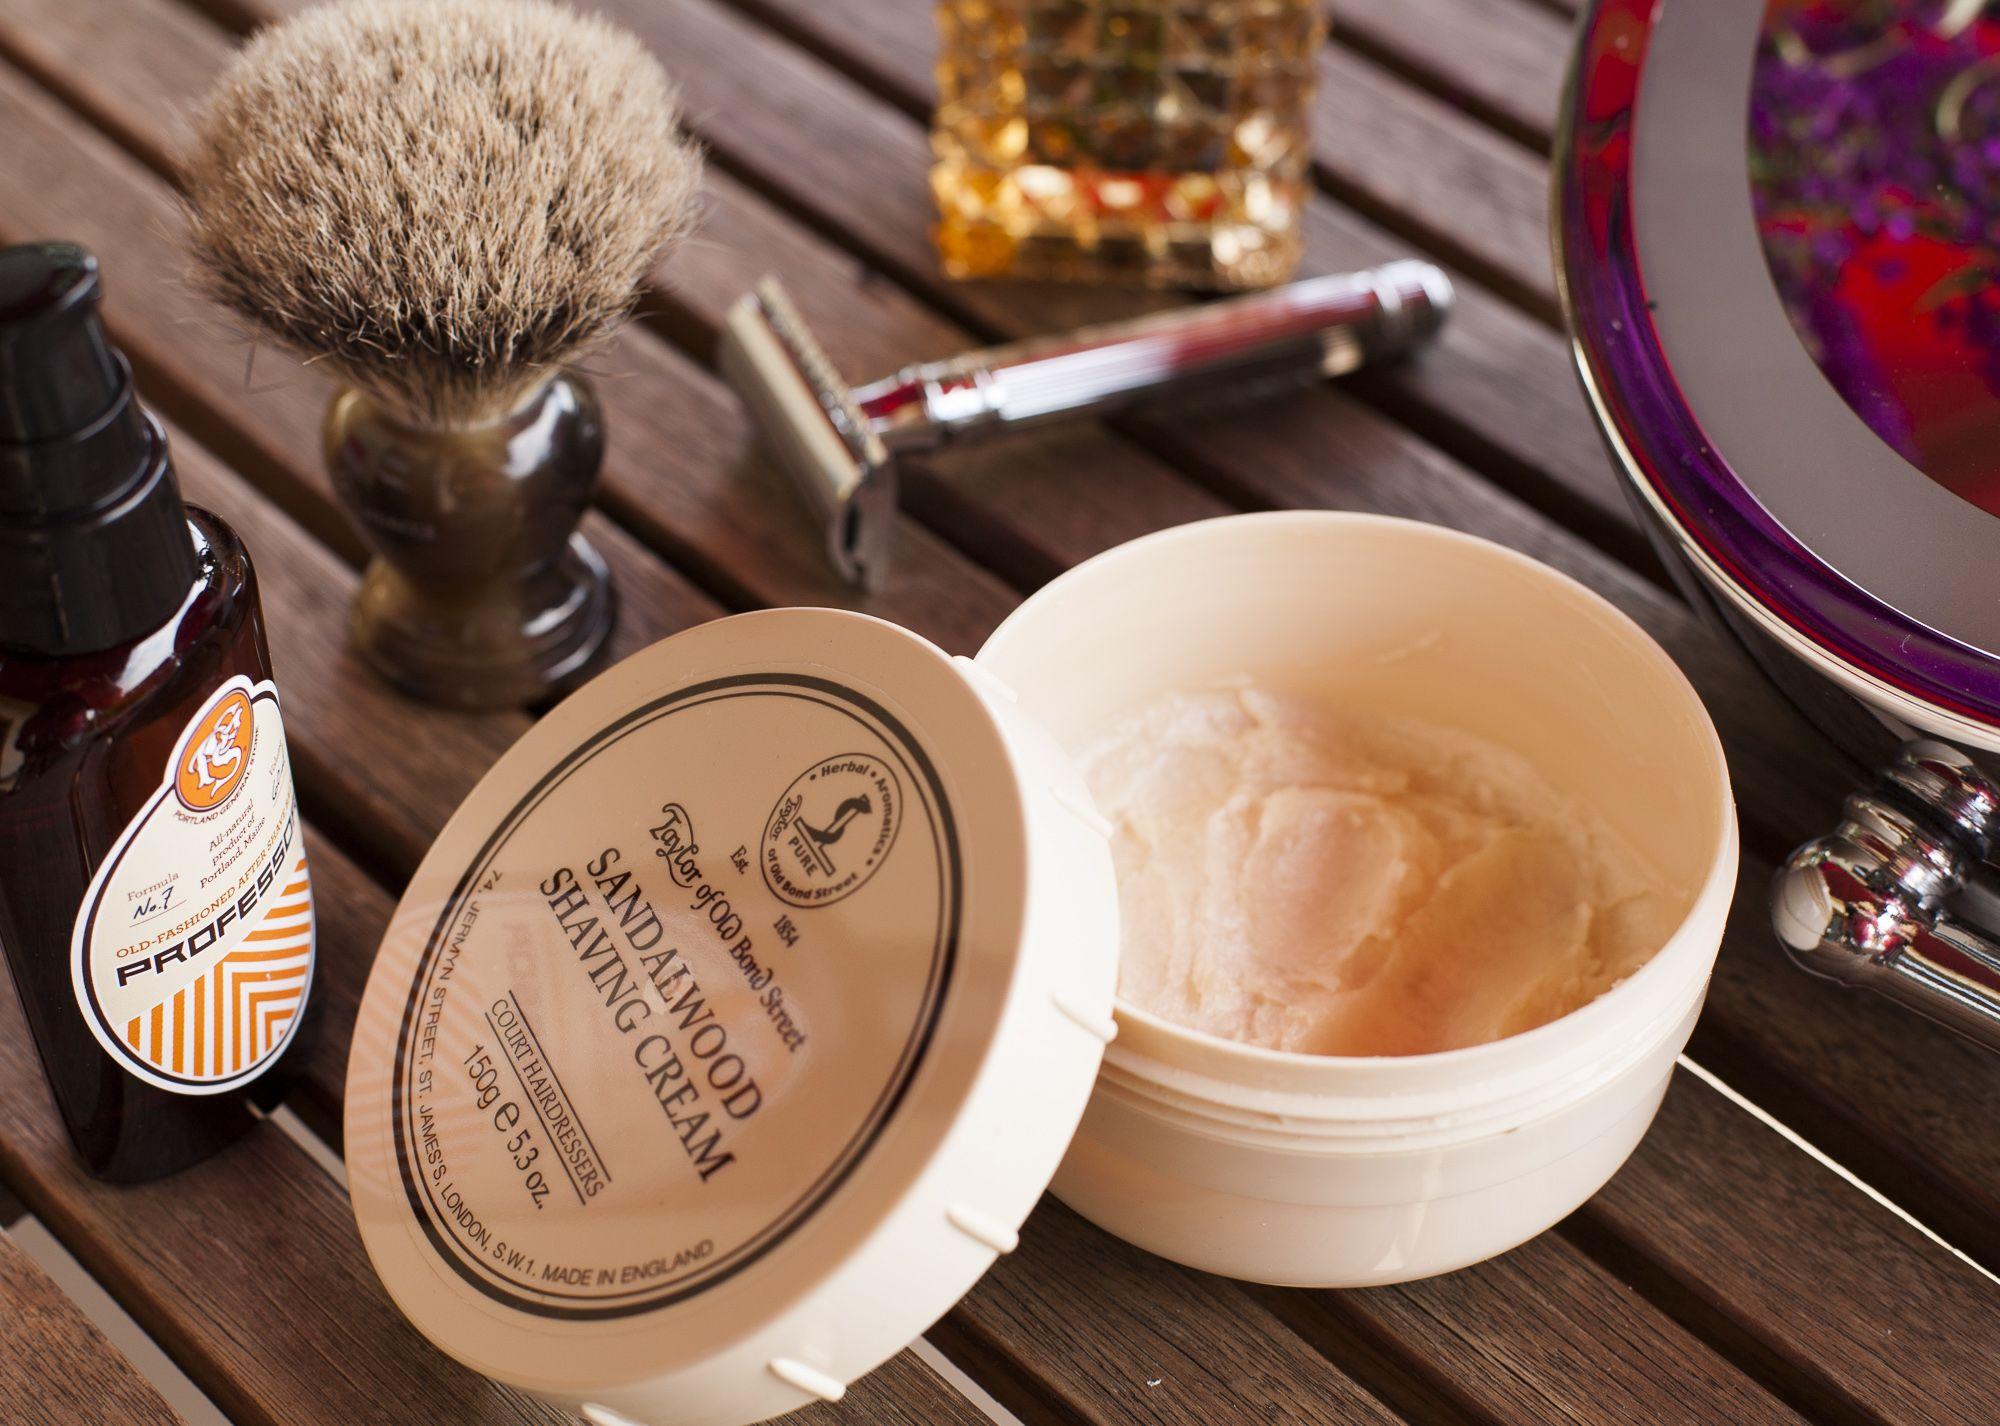 You are currently viewing Taylor of Old Bond Street Sandalwood Shaving Cream – recenzja kremu do golenia